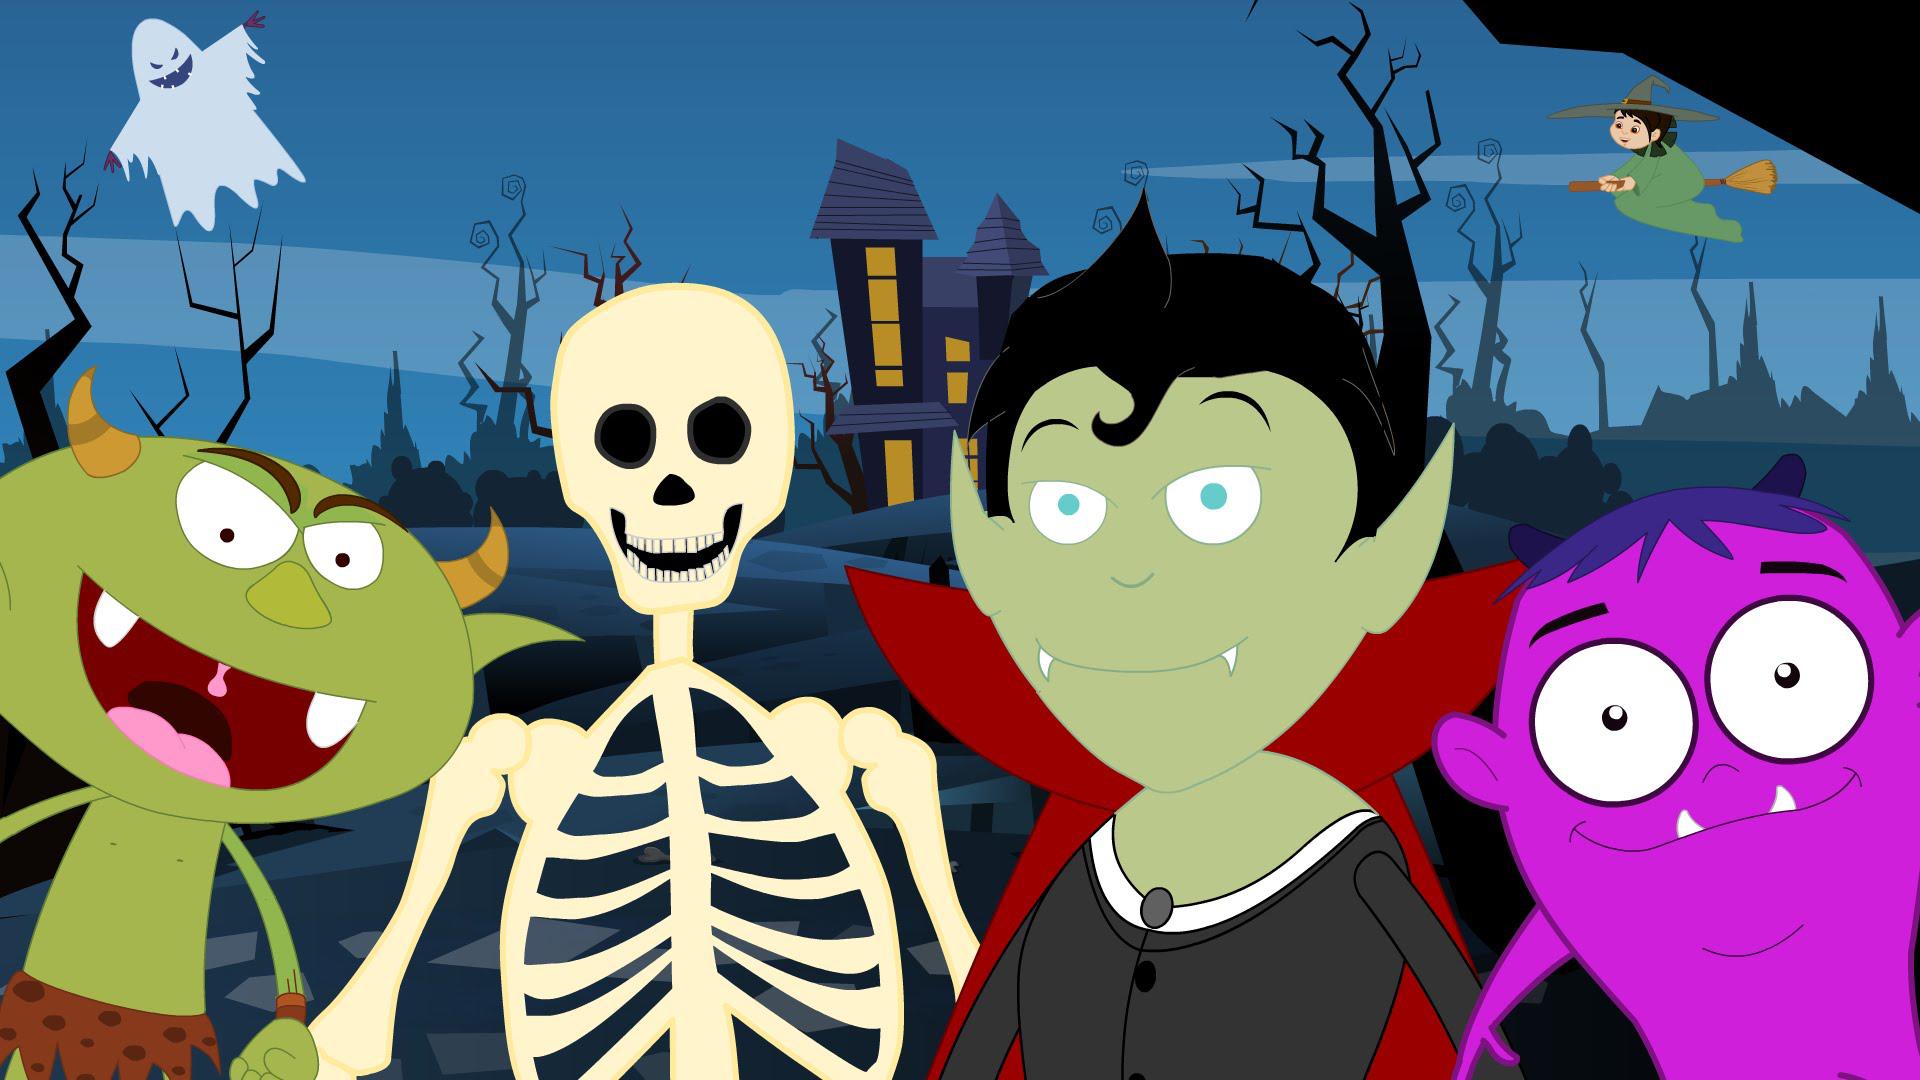 Kumpulan DP BBM Gambar Dan Animasi Halloween SI MOMOT